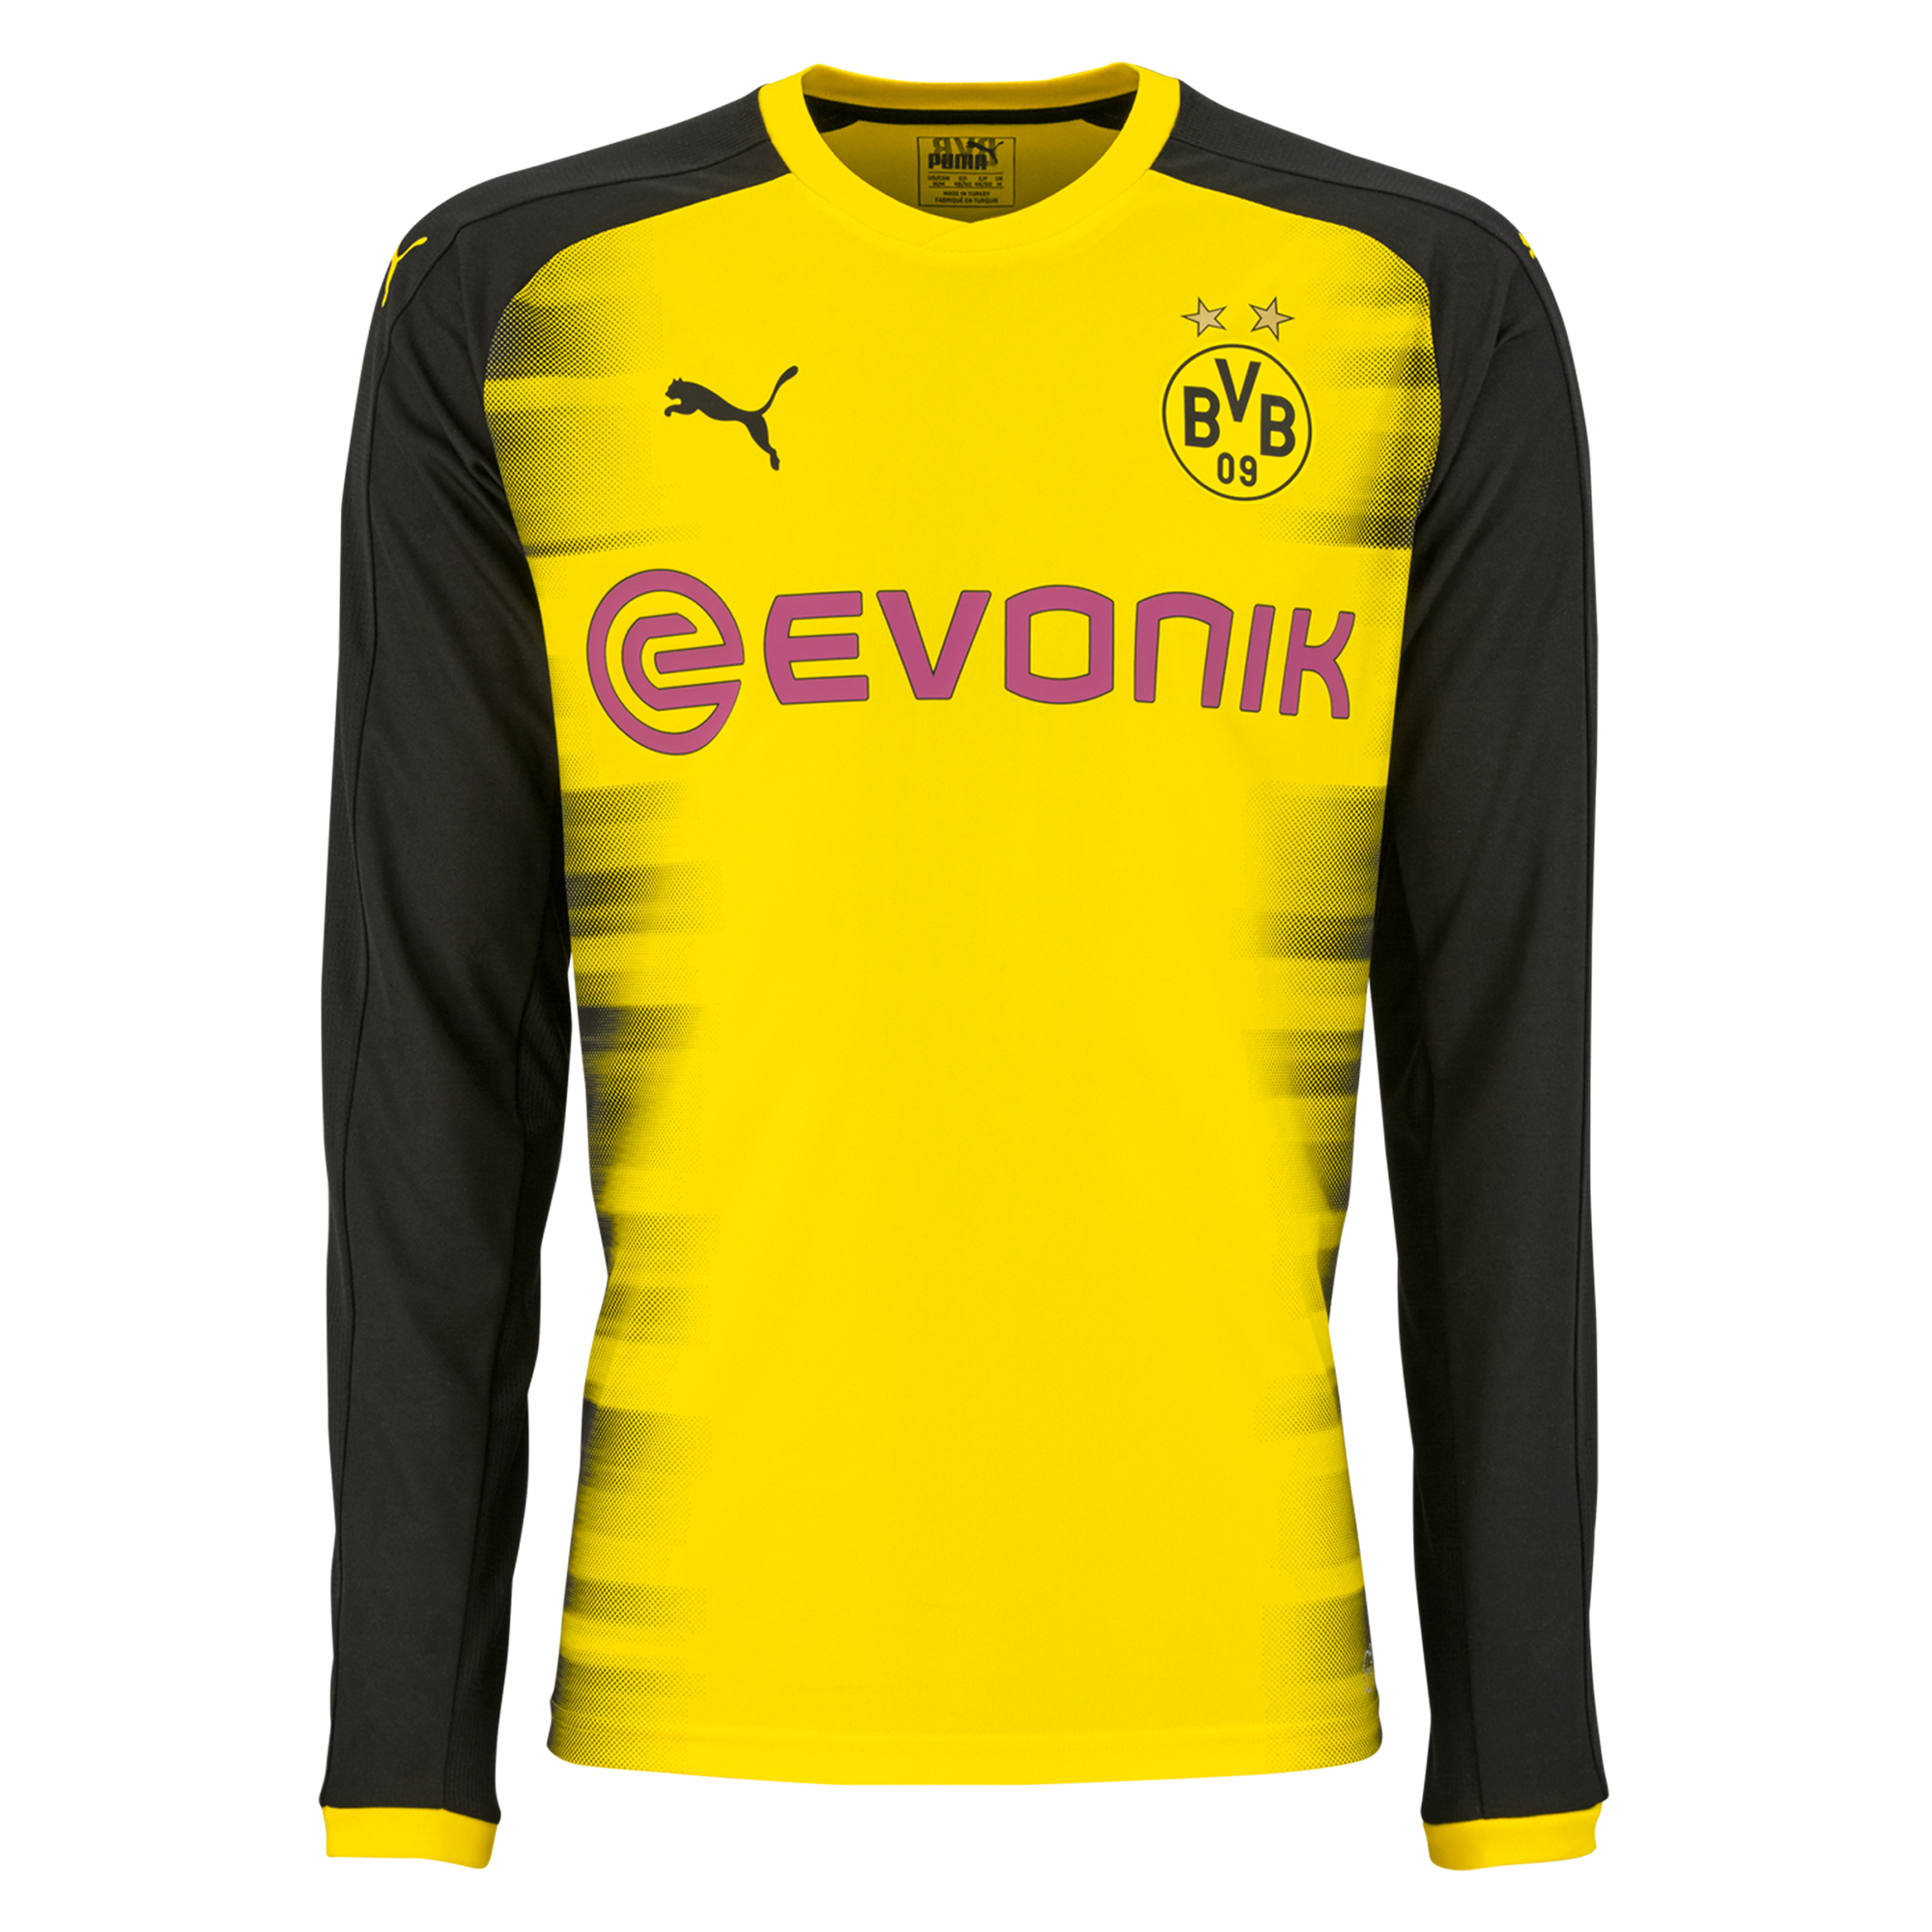 huge selection of 480ca 771c7 Borussia Dortmund 17/18 Puma International Kit | 17/18 Kits ...